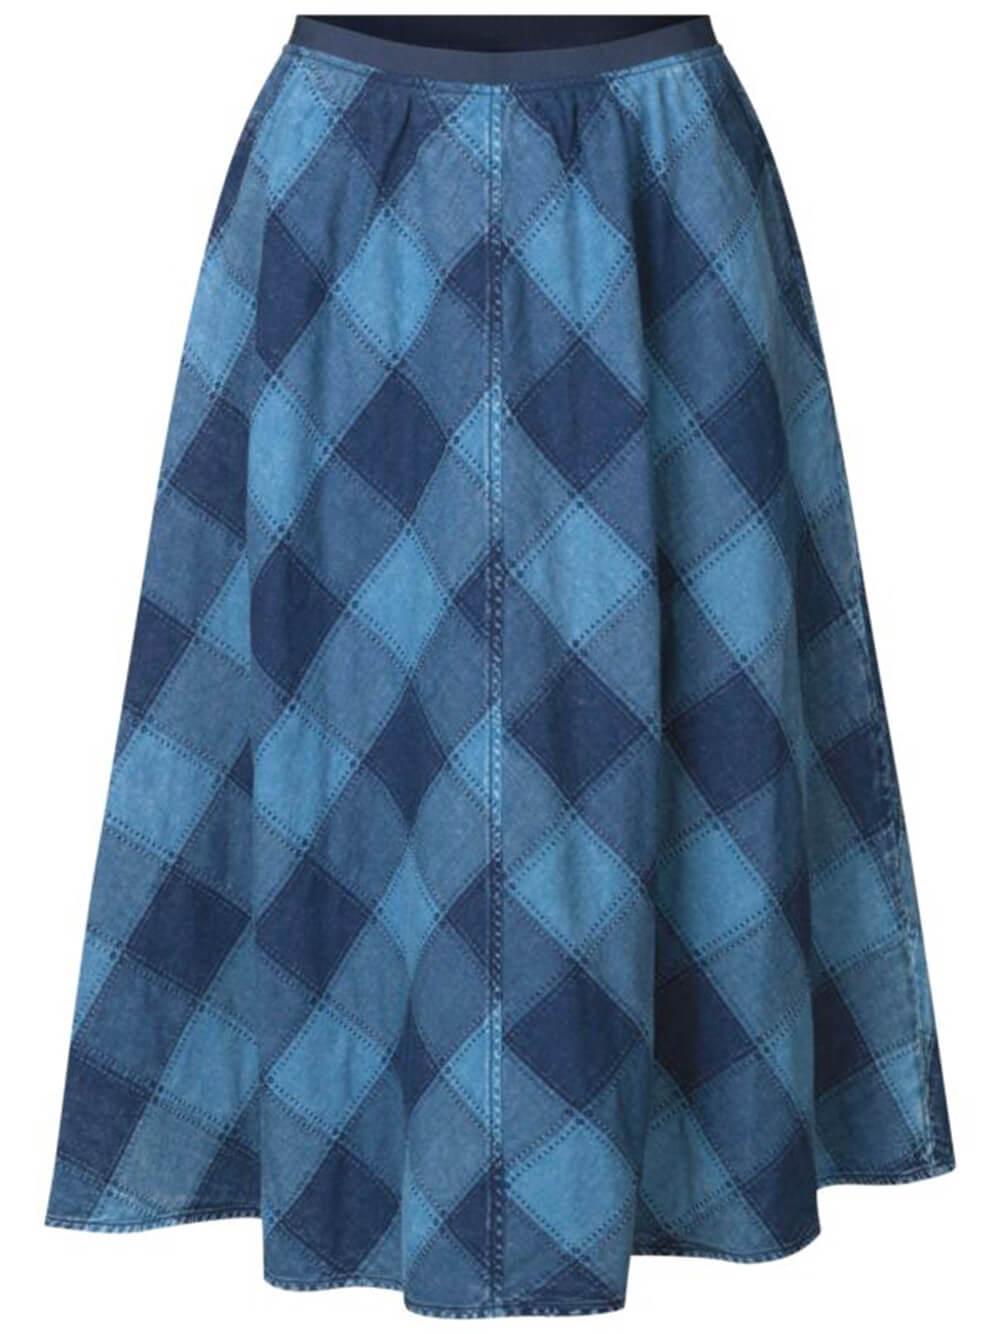 Shrella Skirt